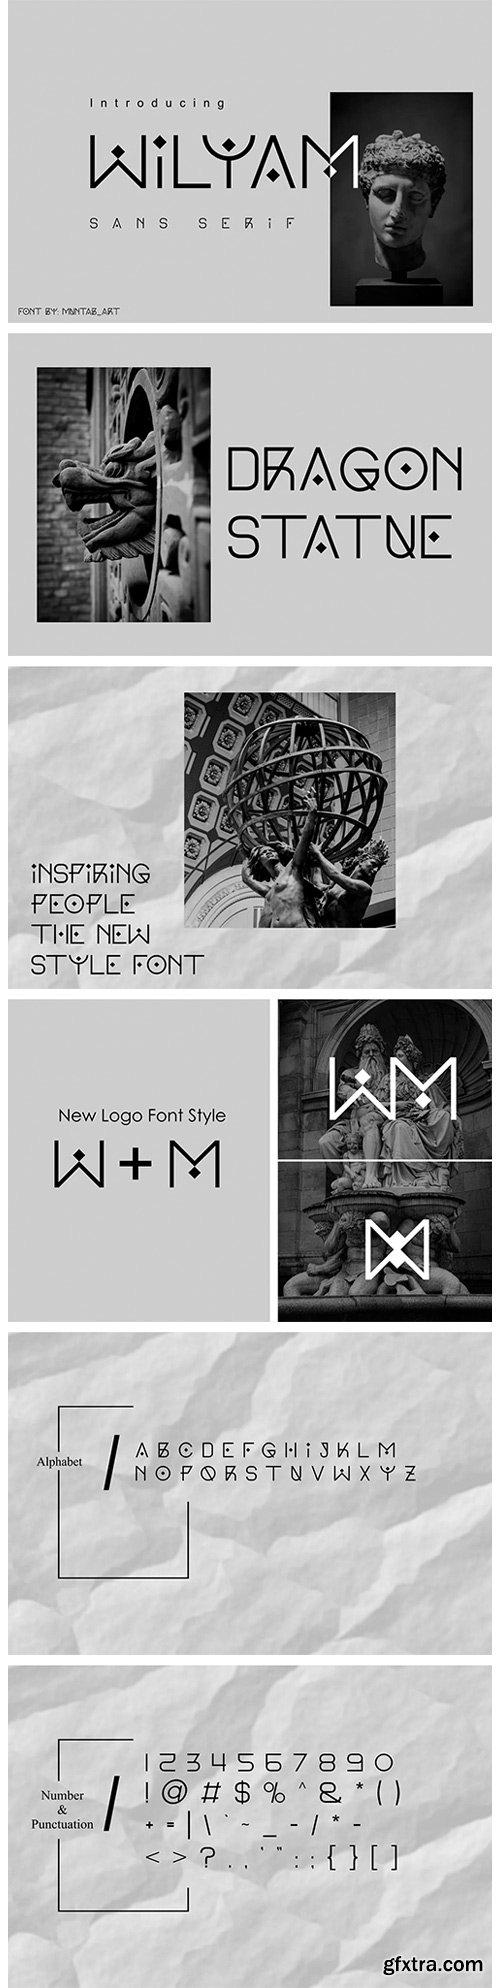 CM - Wilyam | Modern Sans Serif Font 5833707